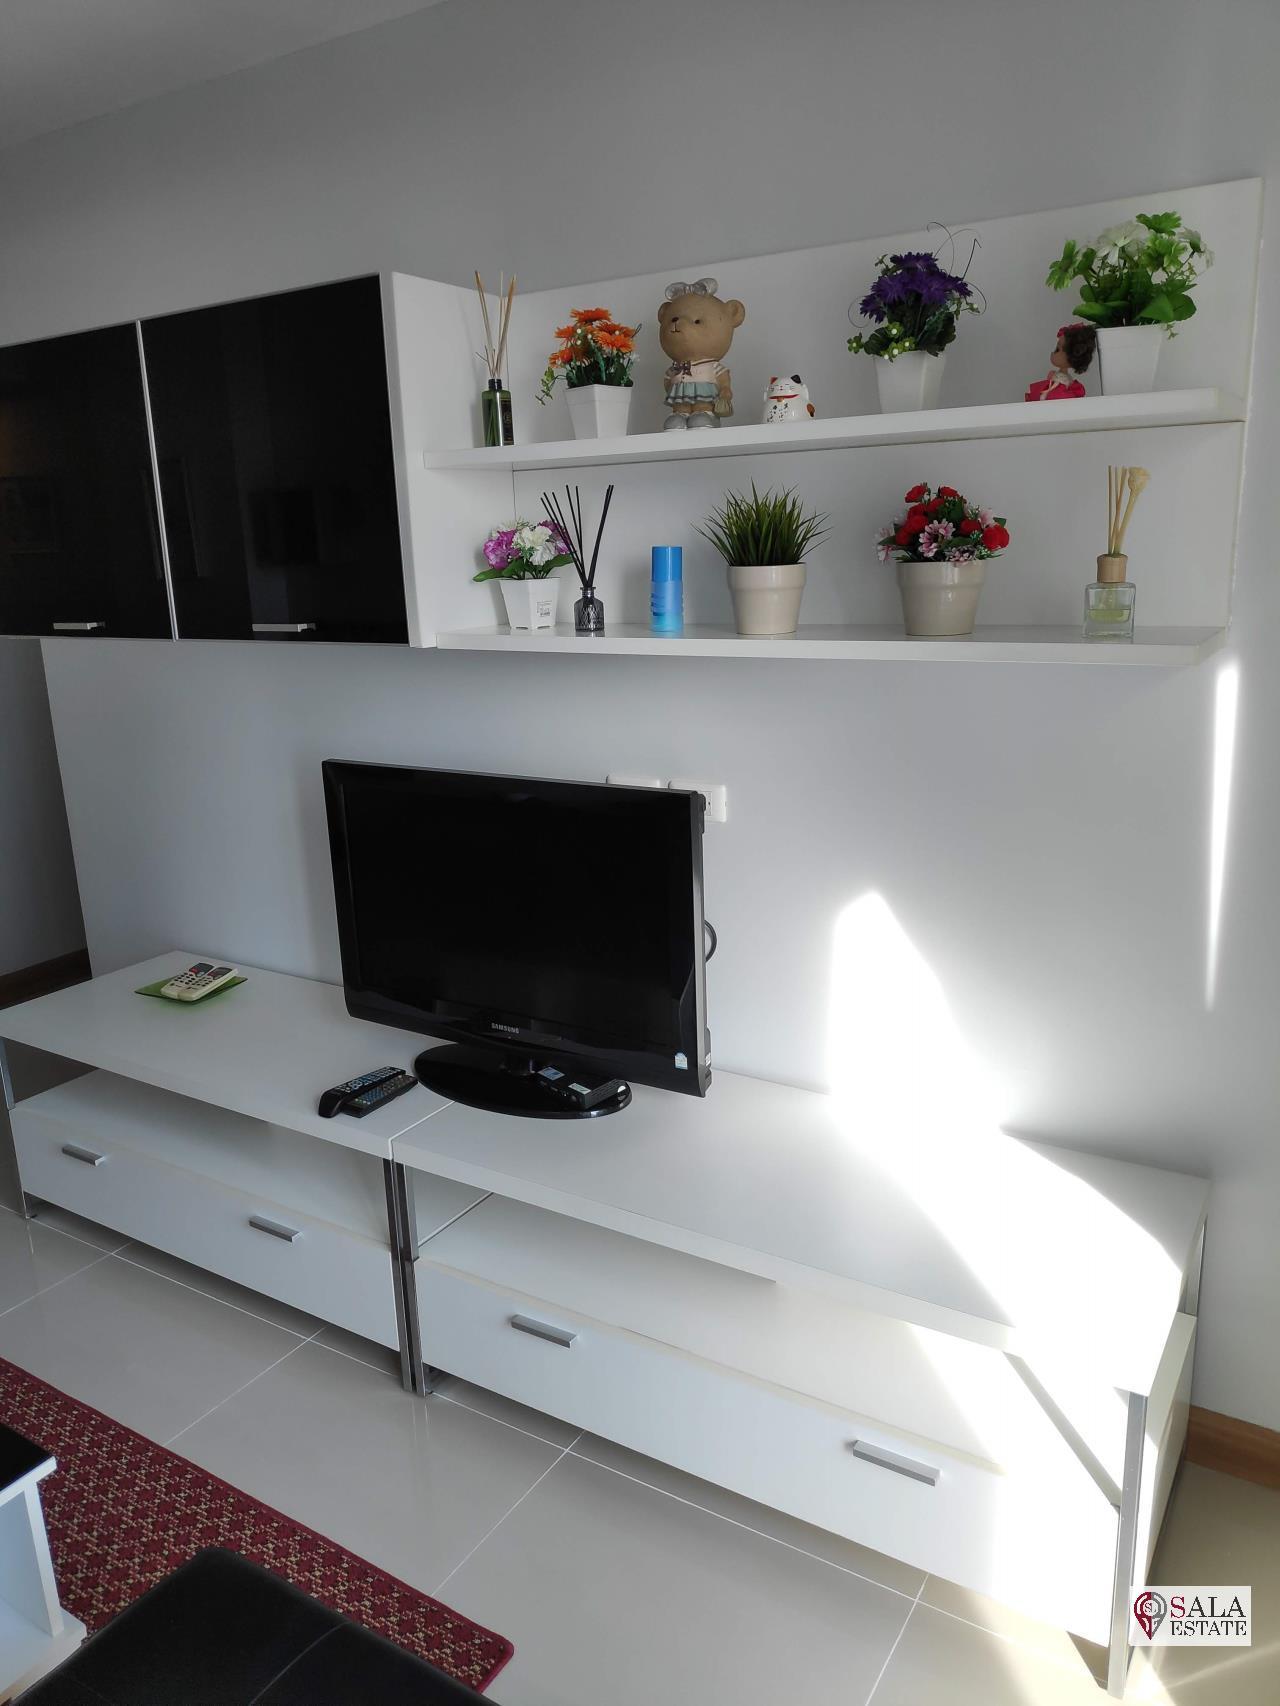 SALA ESTATE Agency's SUPALAI PREMIER NARATHIWAS – BTS CHONG NONSI, 1 BEDROOM 1 BATHROOM, FULLY FERNISHED, CITY VIEW 5